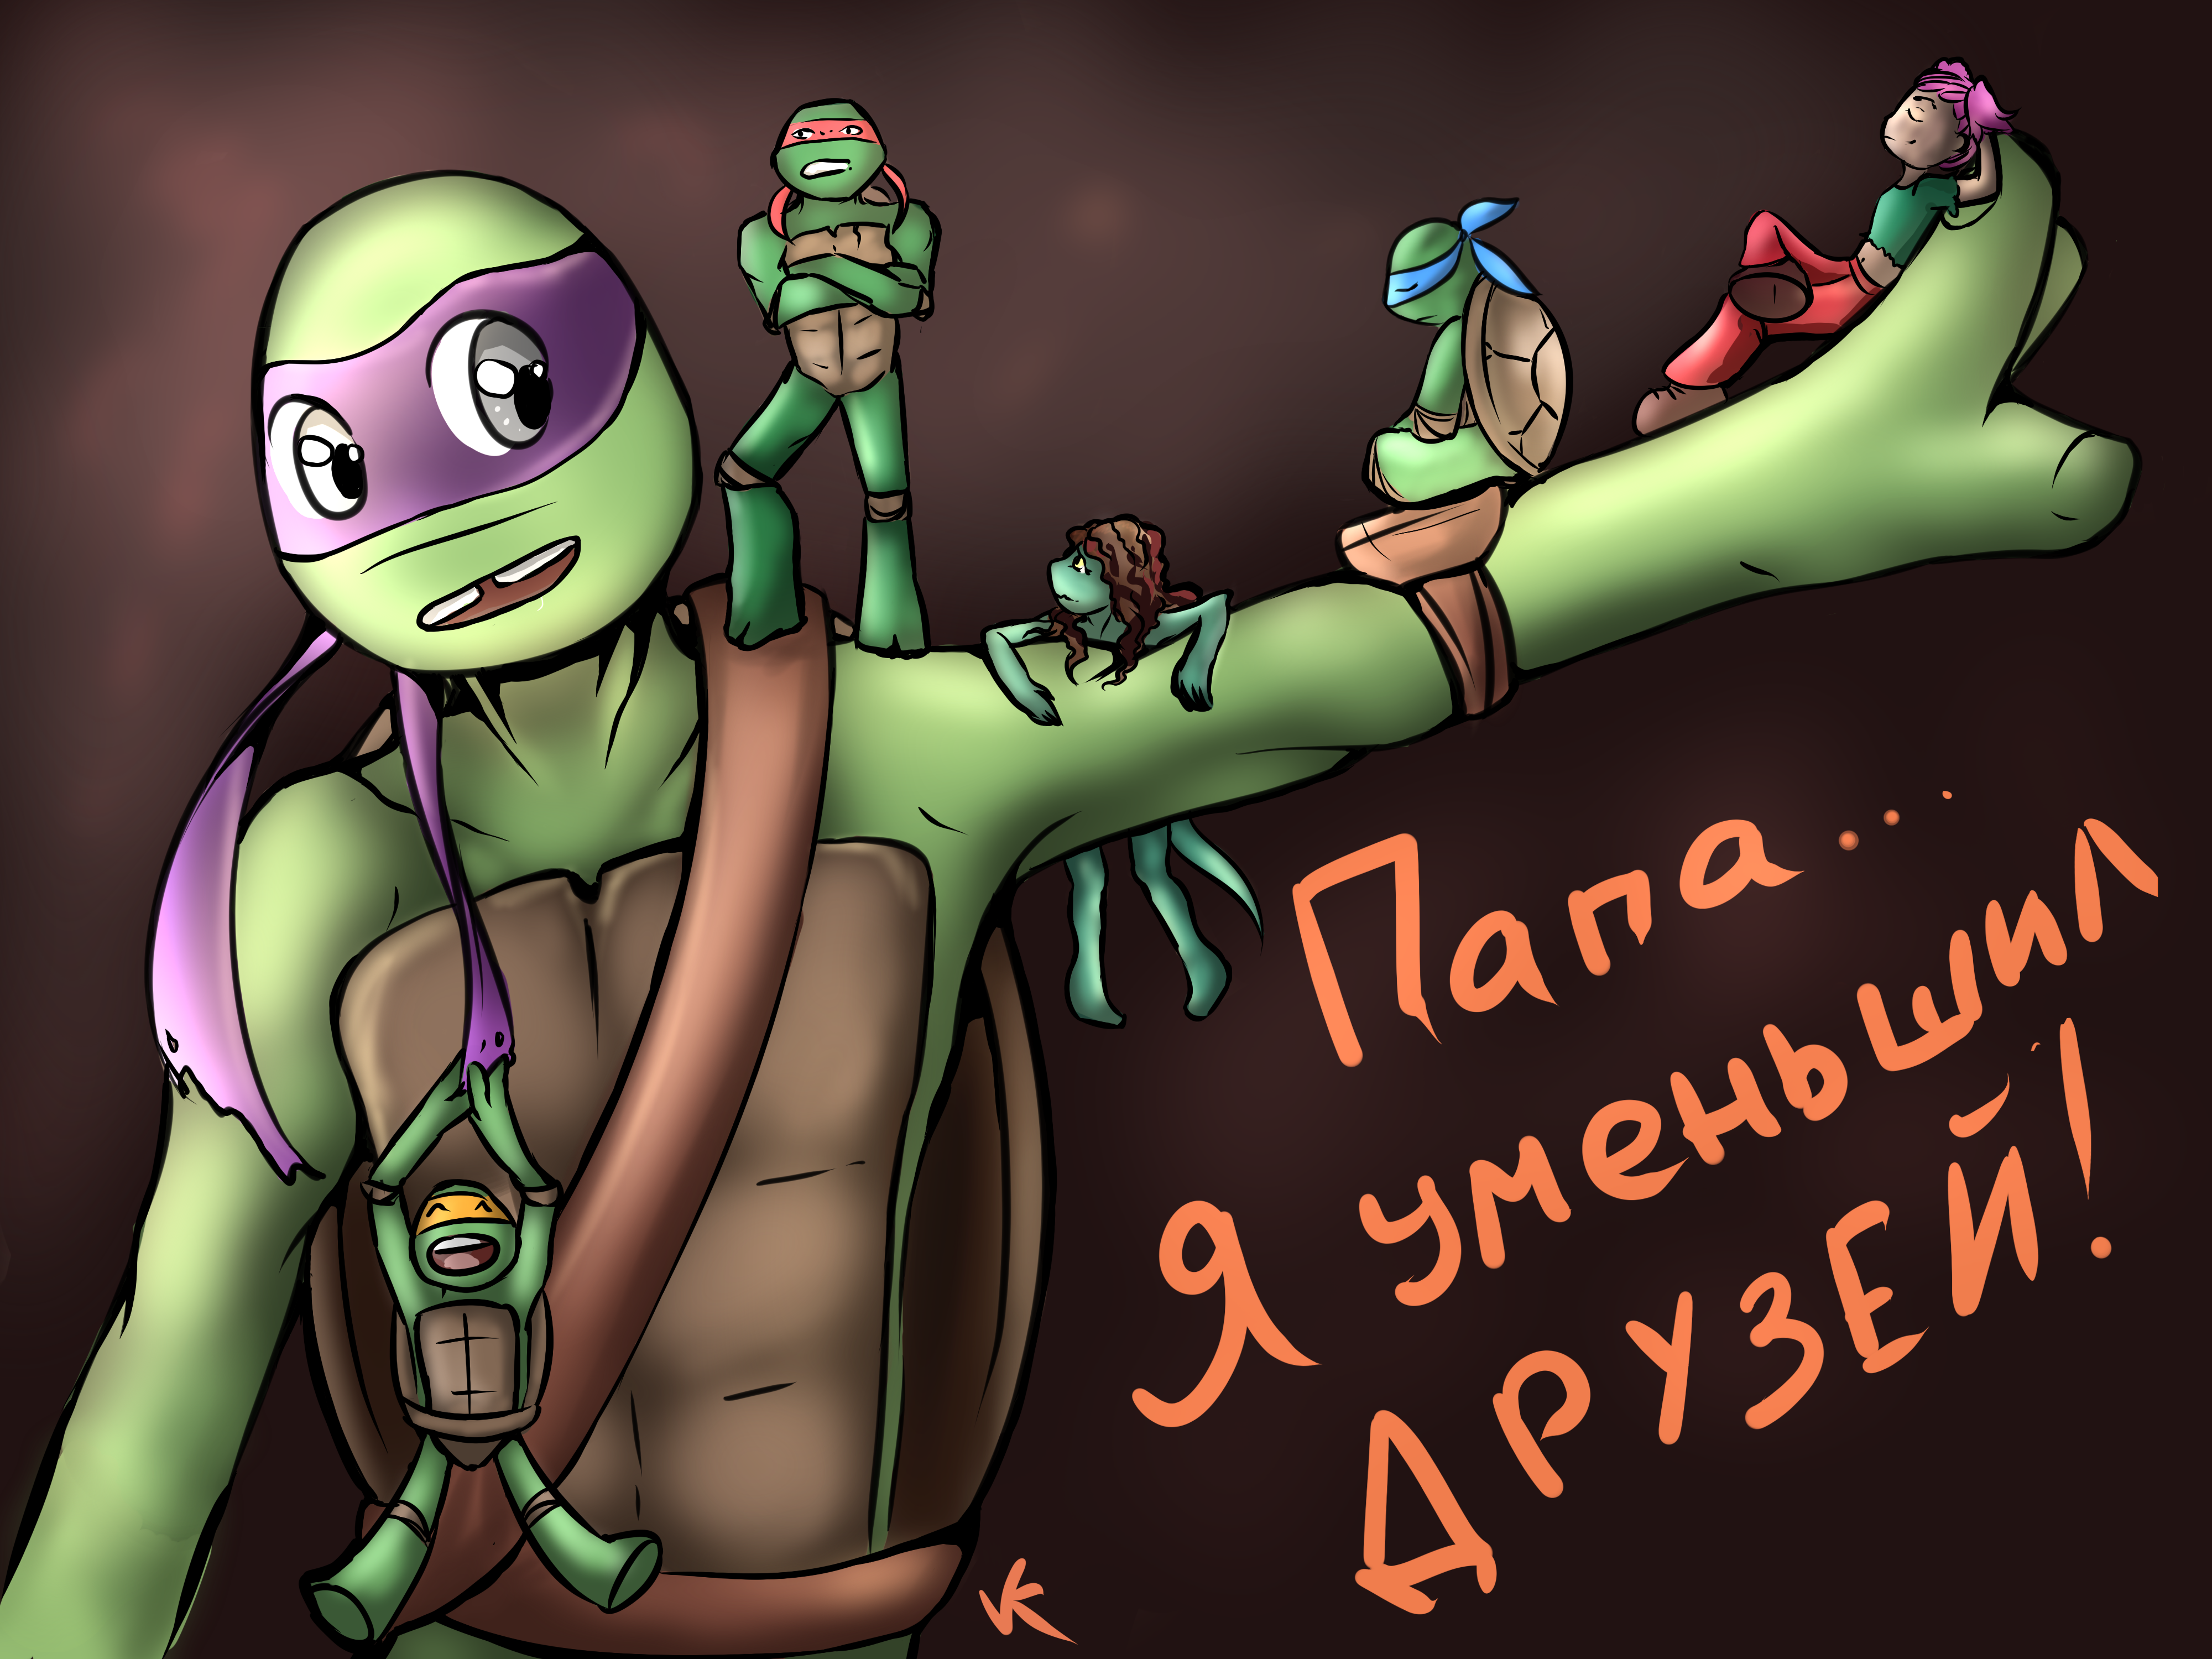 http://se.uploads.ru/ROot6.png